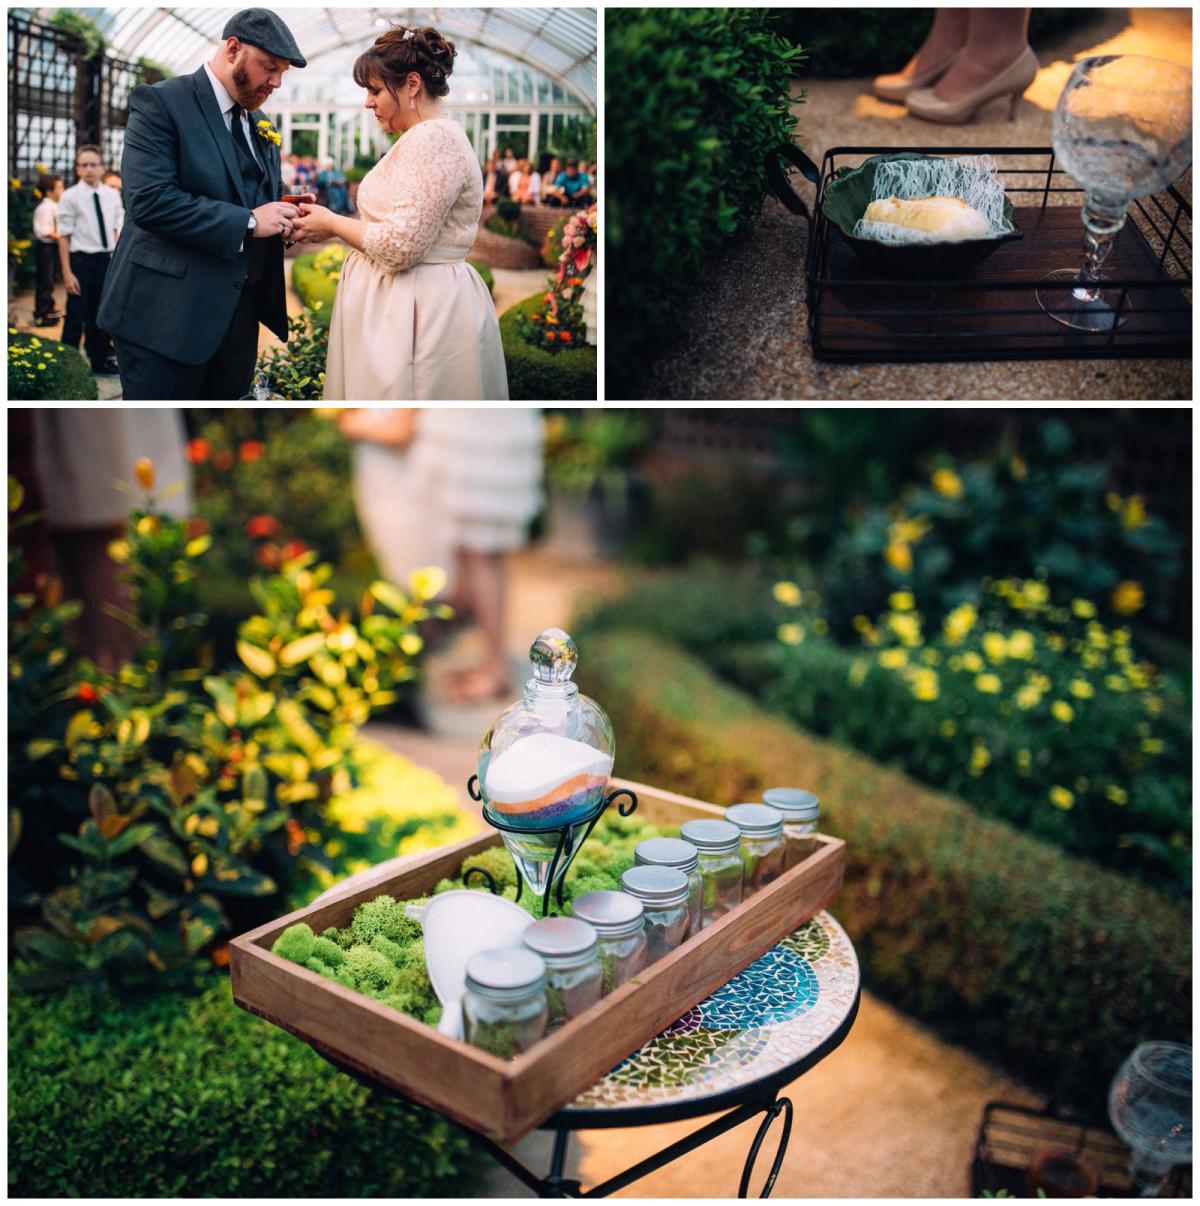 wild-native-photography-wedding-pittsburgh-phipps-blake22